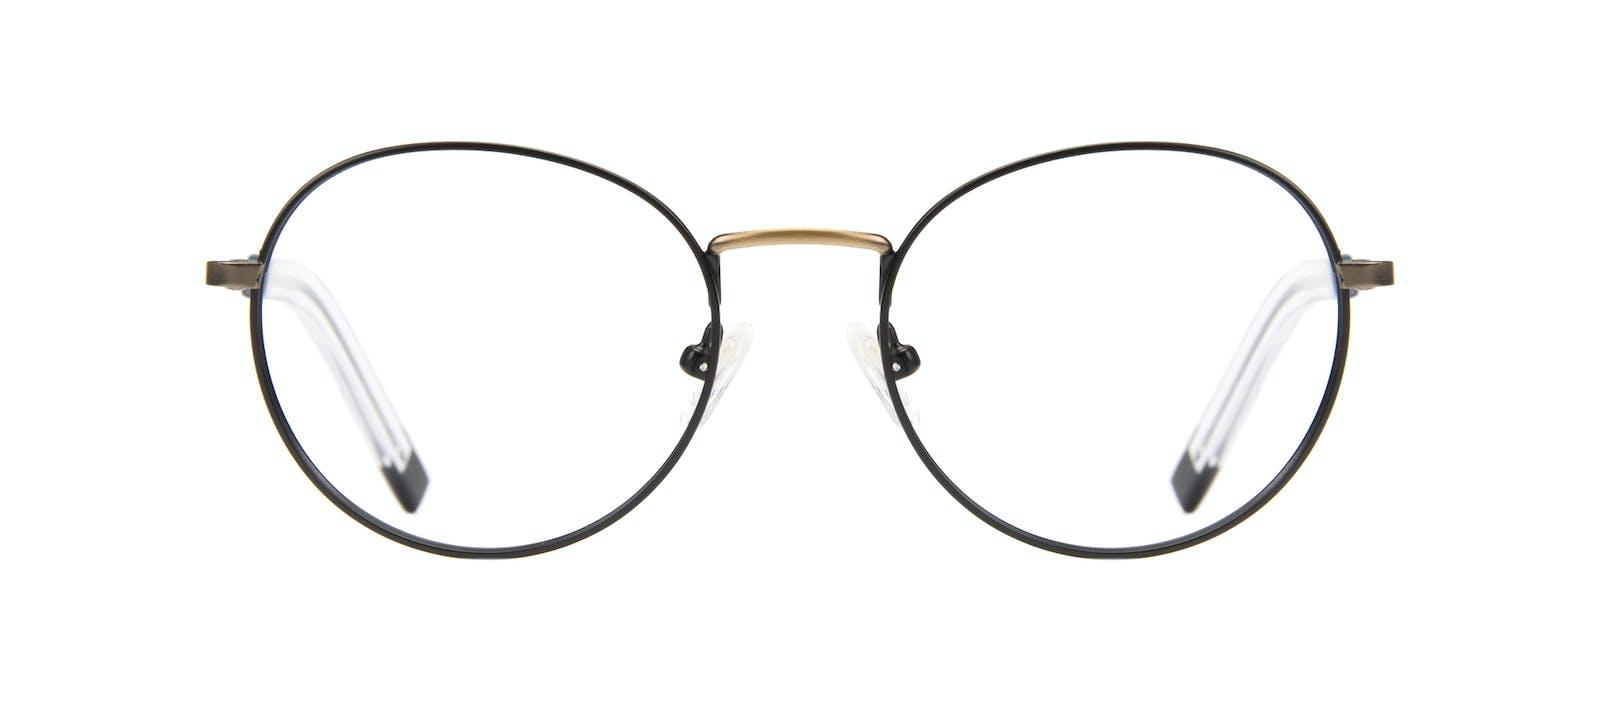 dd91f2f2b4 Affordable Fashion Glasses Round Eyeglasses Men Lean Dark Brass Front